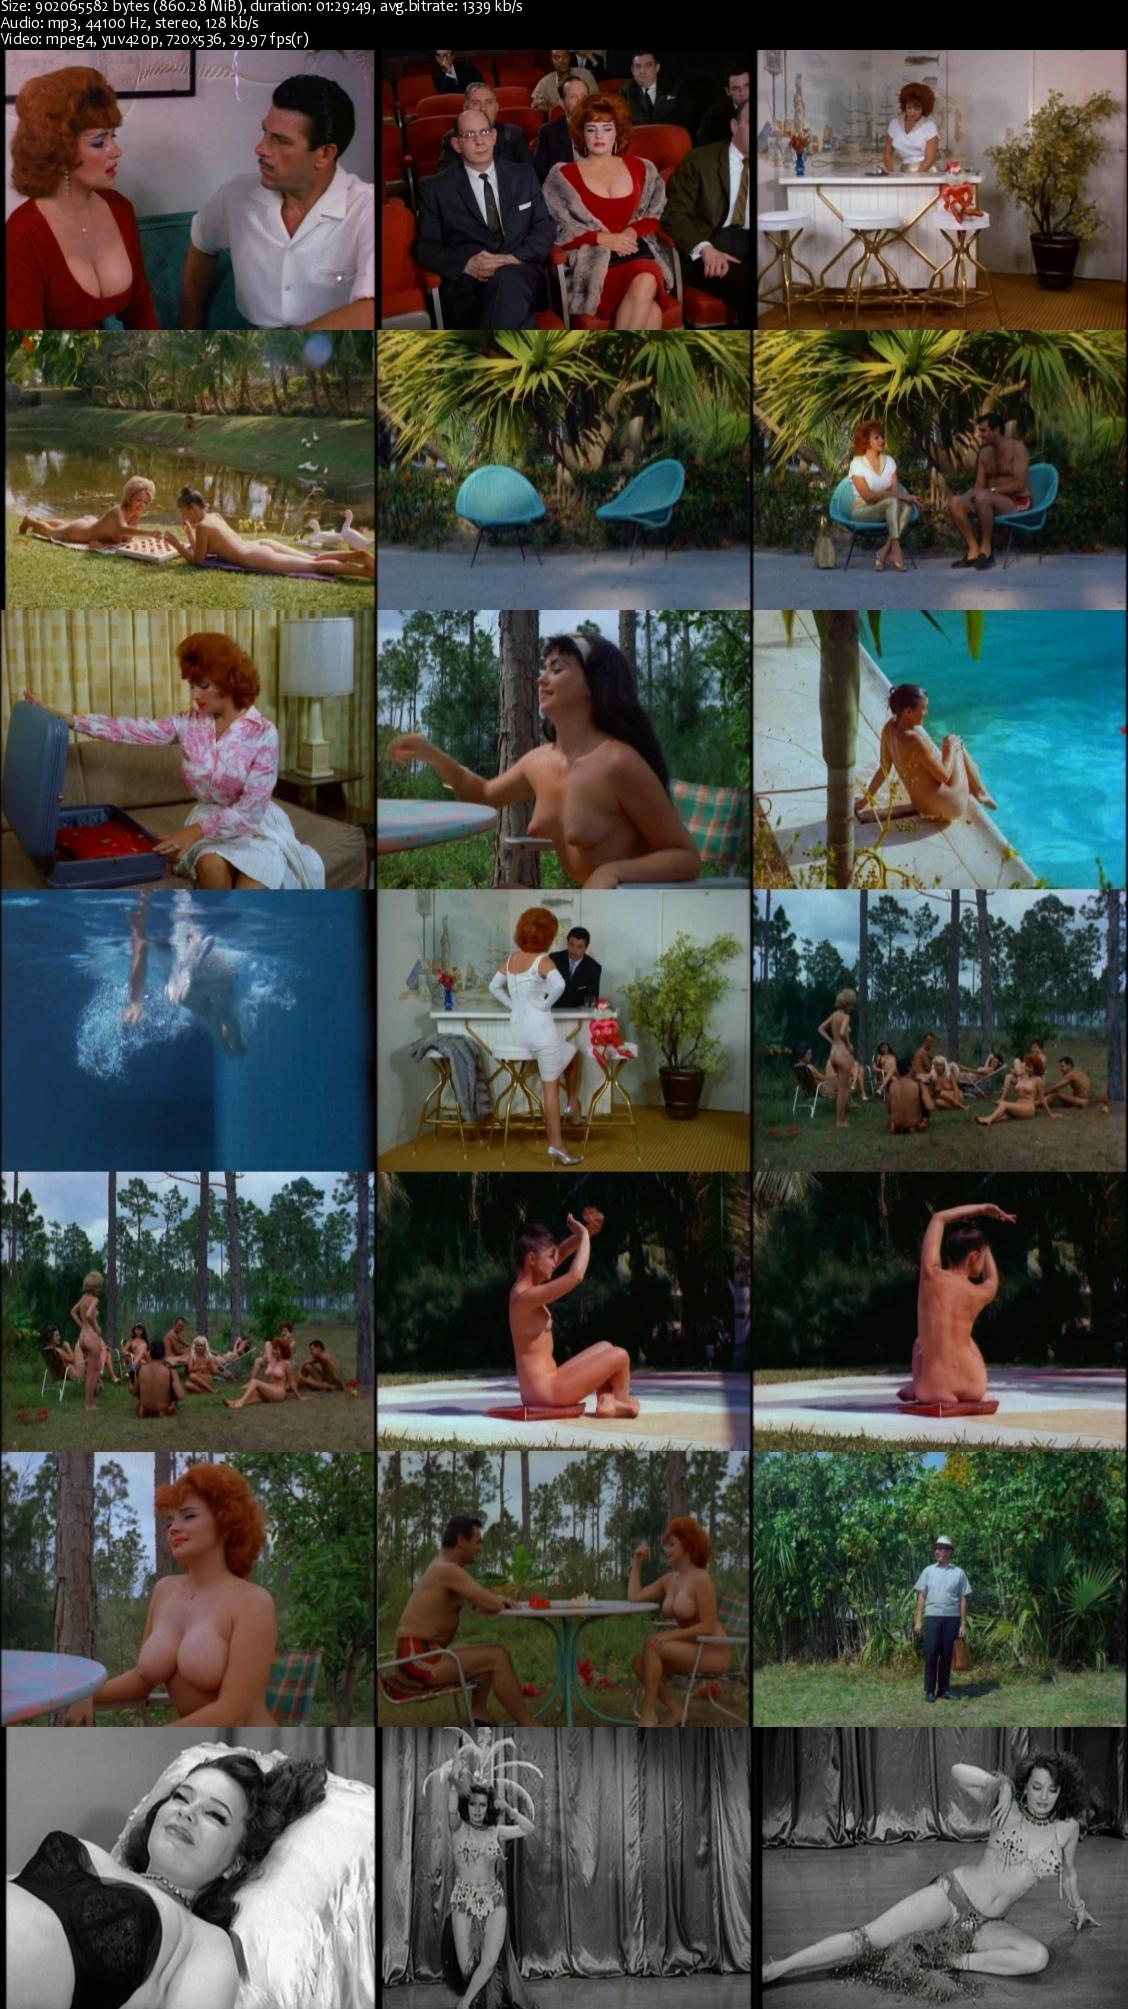 blaze starr goes nudist 1962